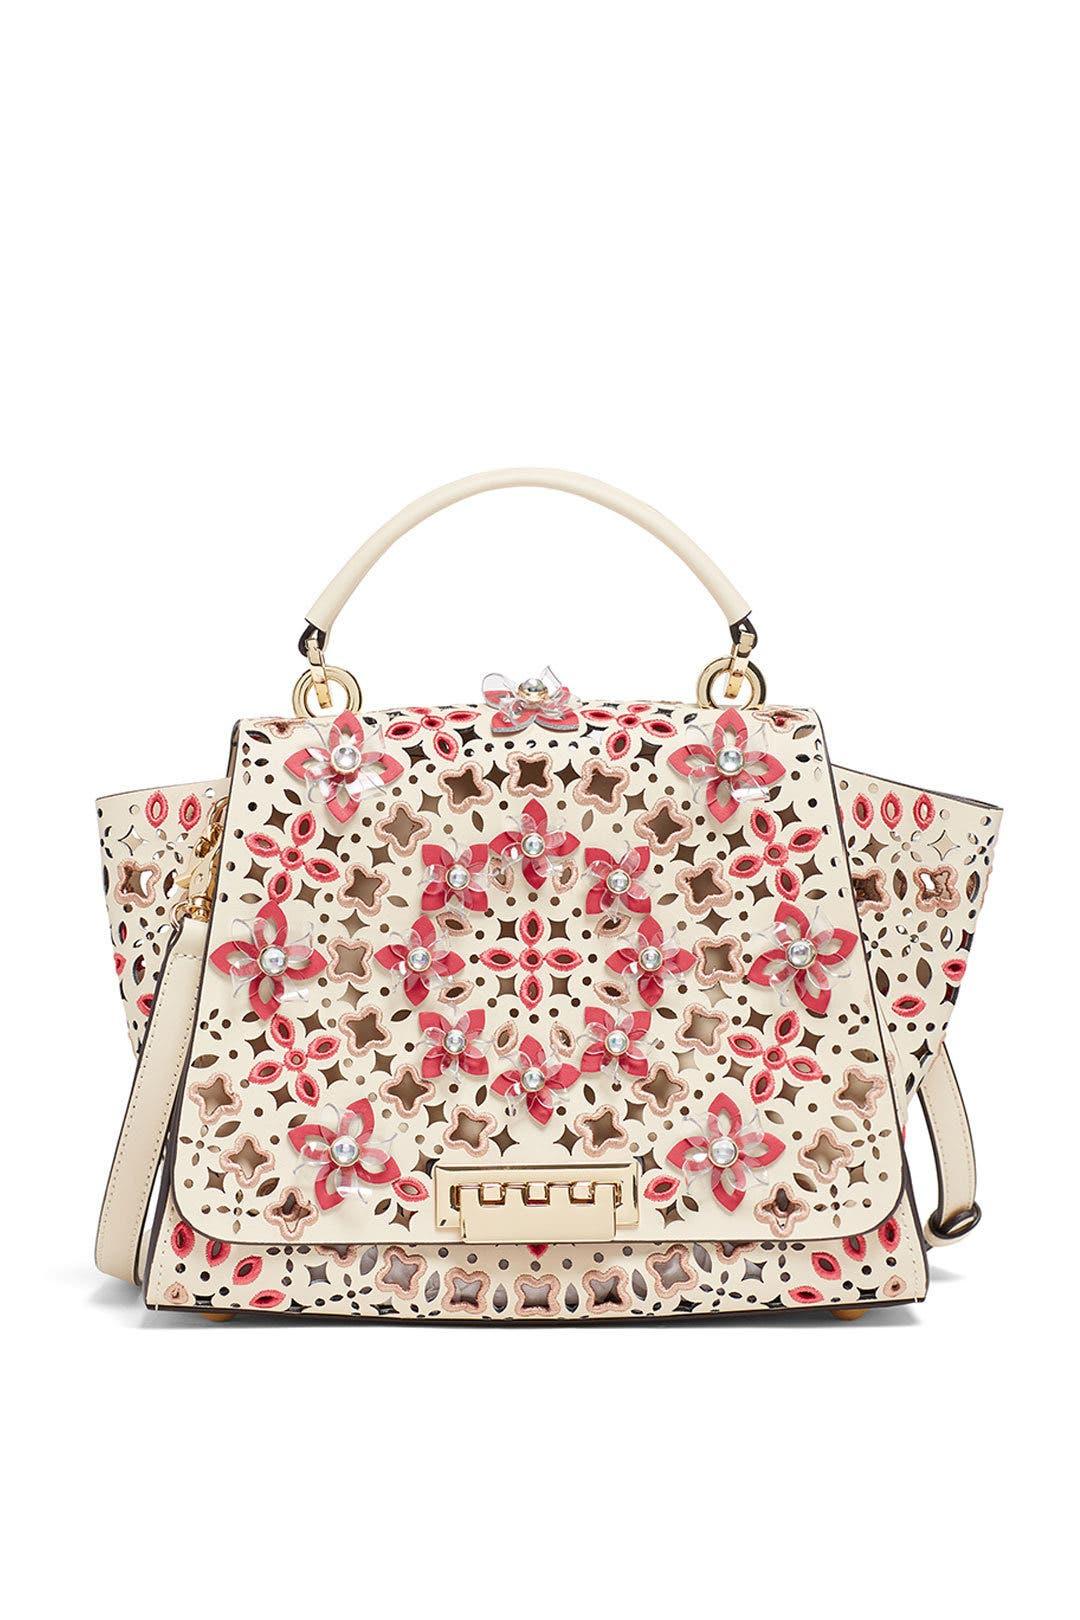 Ivory Eartha Soft Top Handle Bag By Zac Zac Posen Handbags